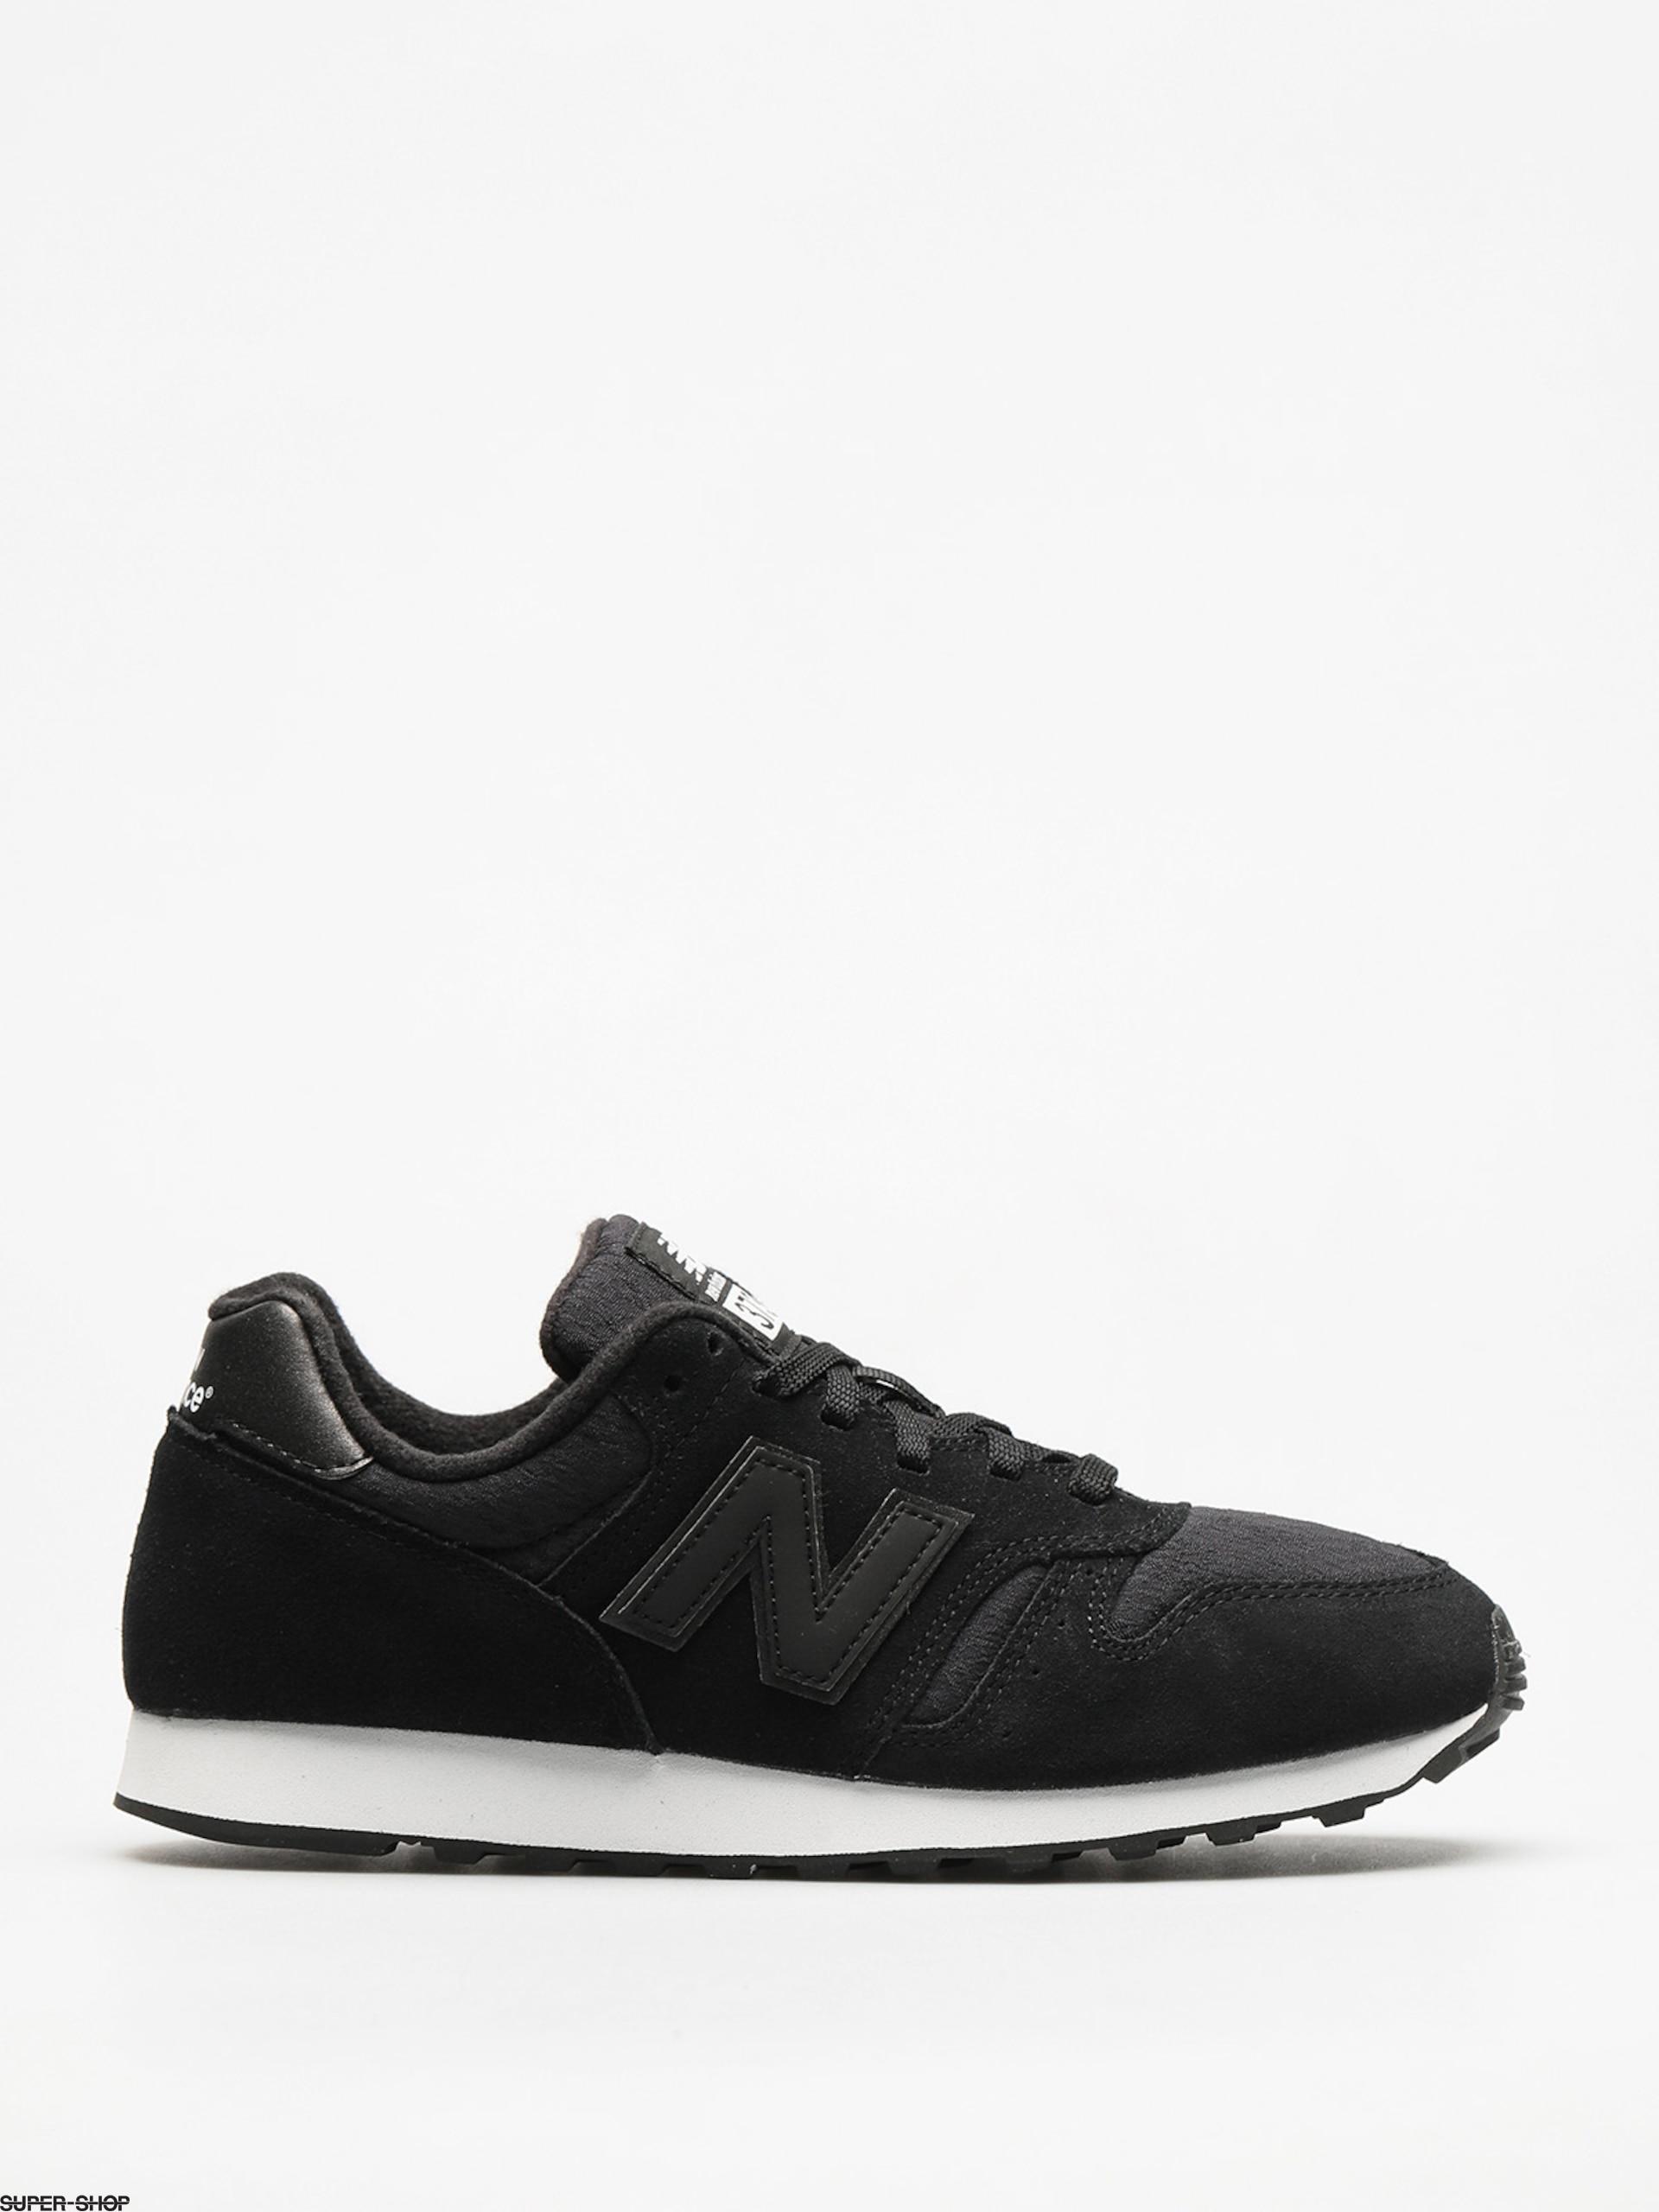 new style 2d129 66e98 New Balance Schuhe 373 Wmn (black/white)